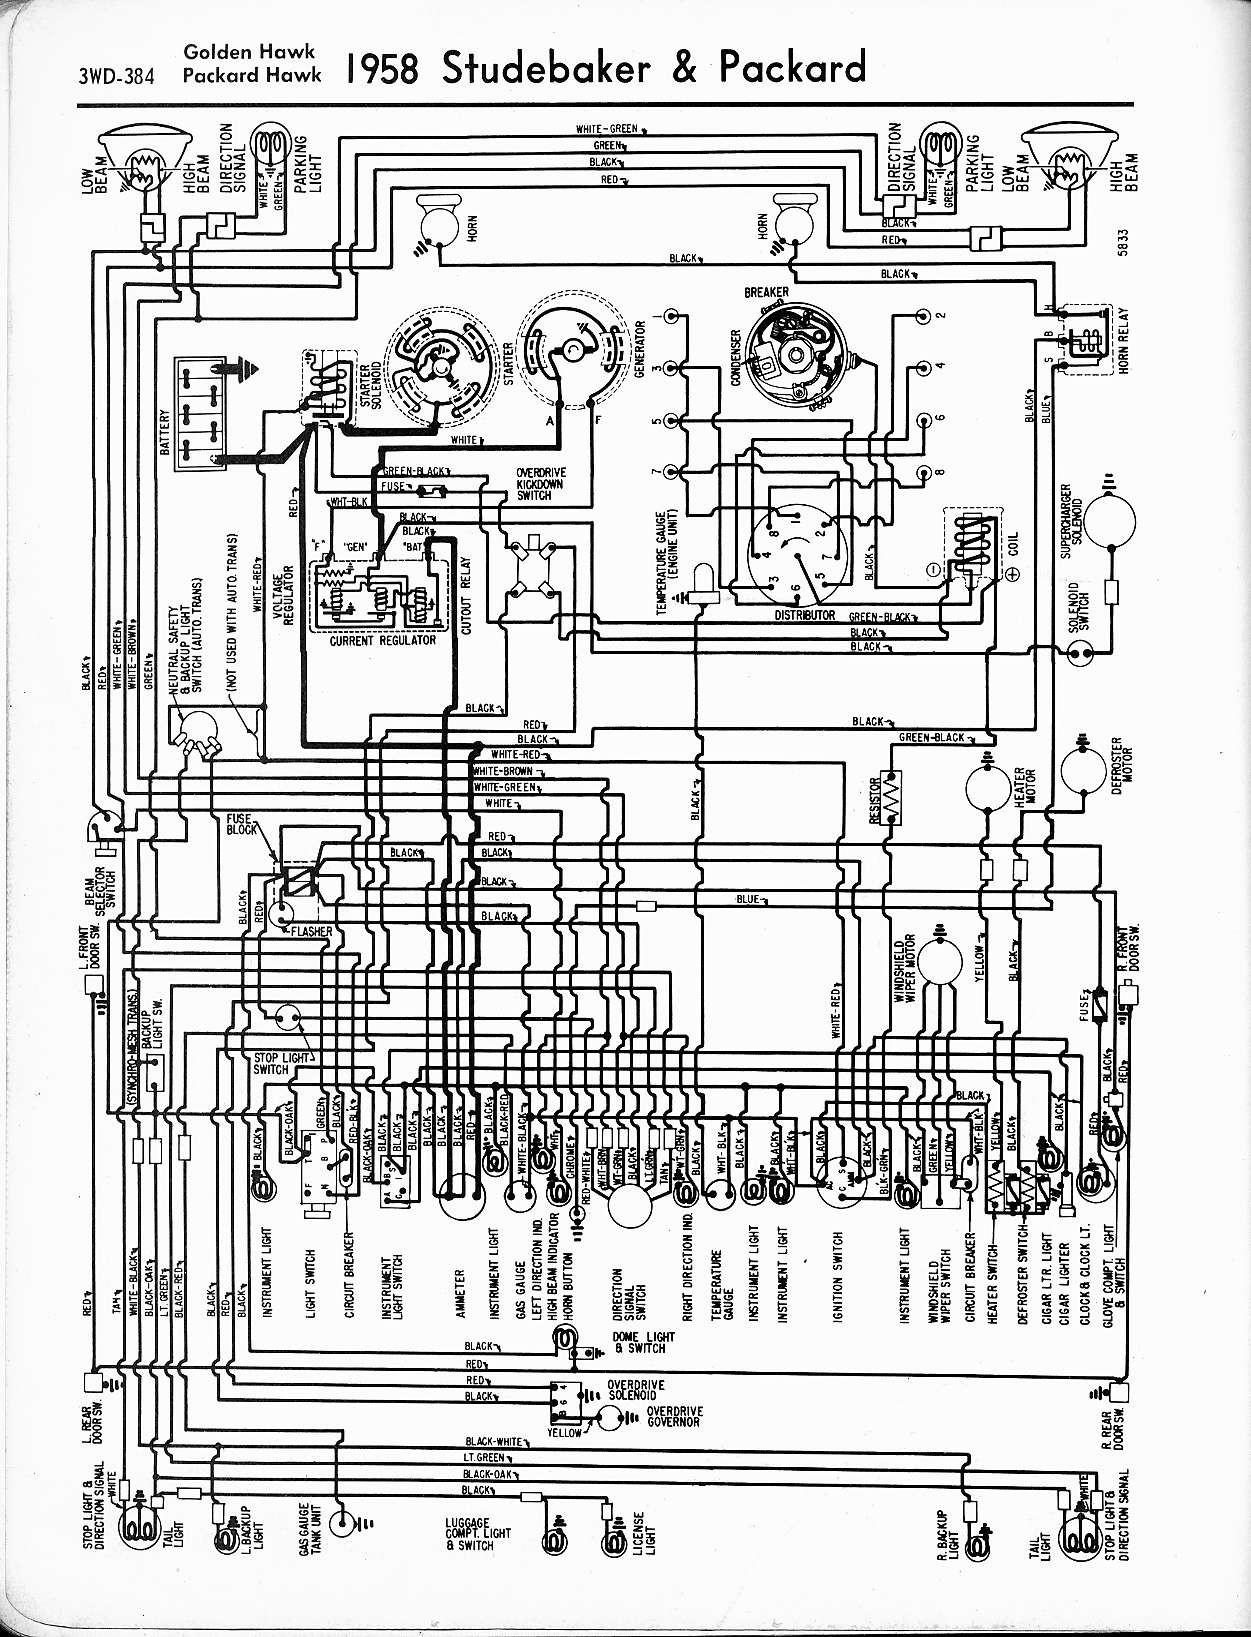 Mercedes Car Wiring Diagram Studebaker Technical Help Studebakerparts Of Mercedes Car Wiring Diagram